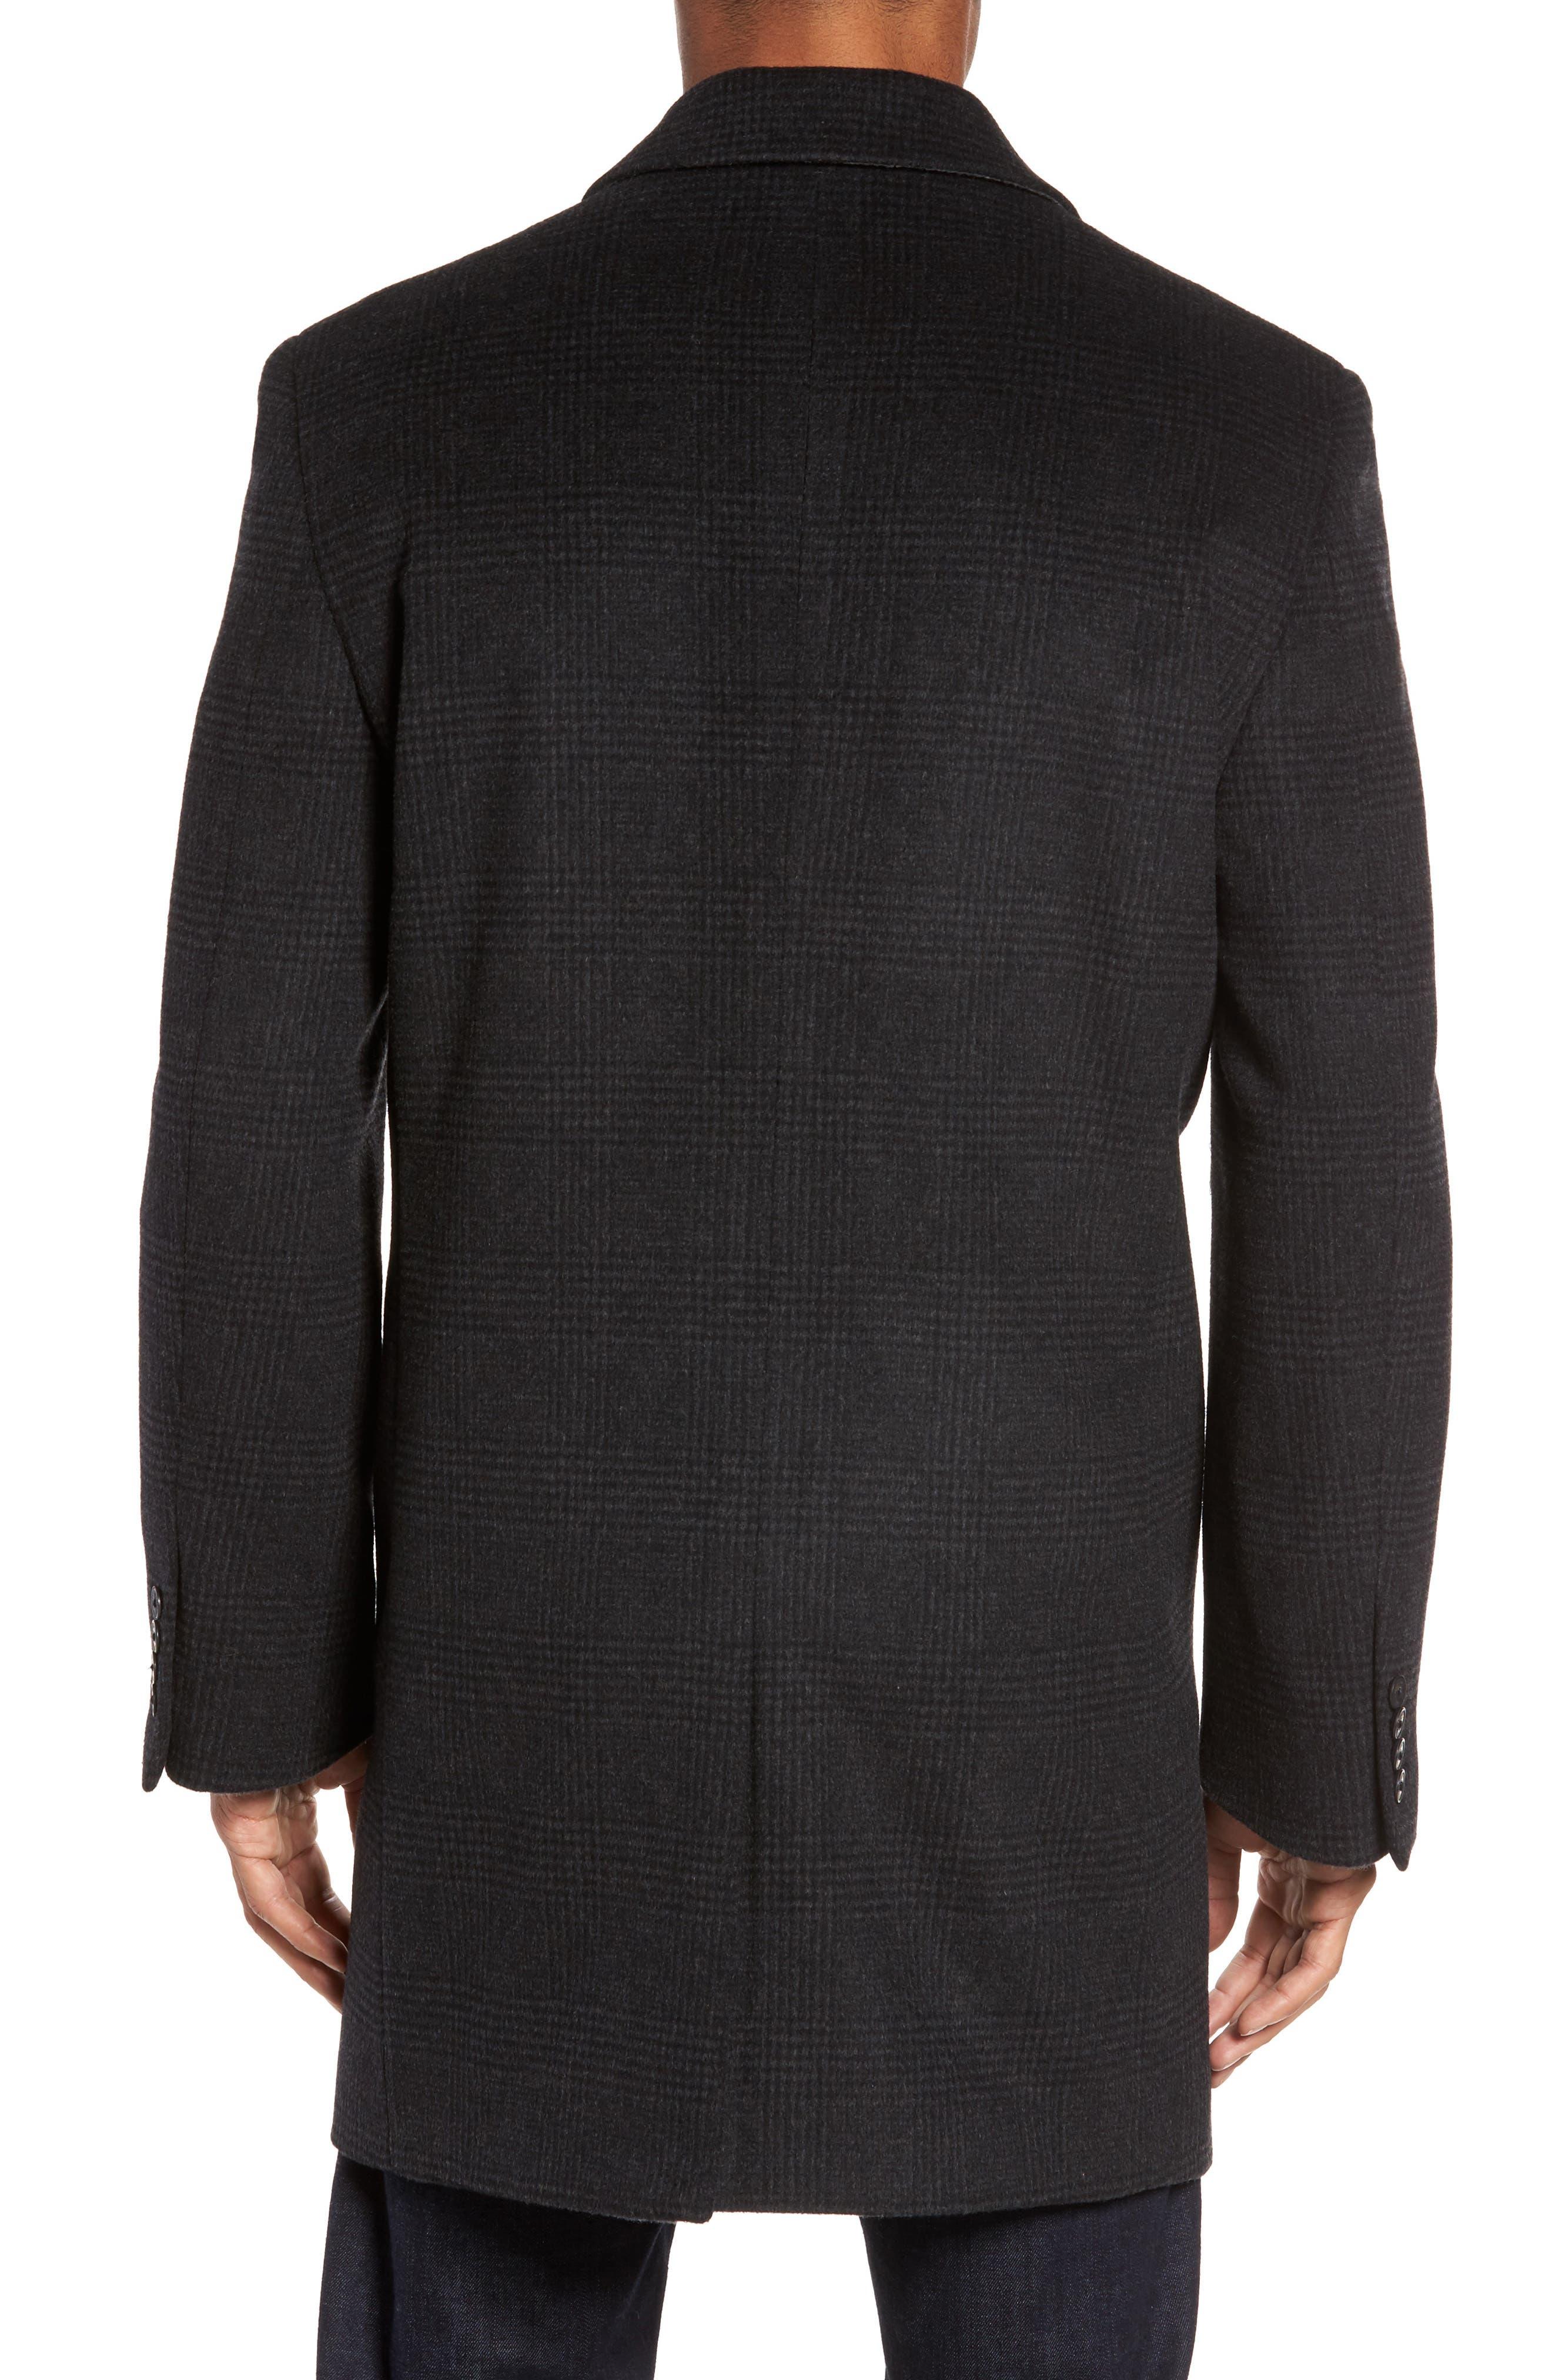 Turner Plaid Wool Blend Topcoat,                             Alternate thumbnail 2, color,                             Dark Charcoal